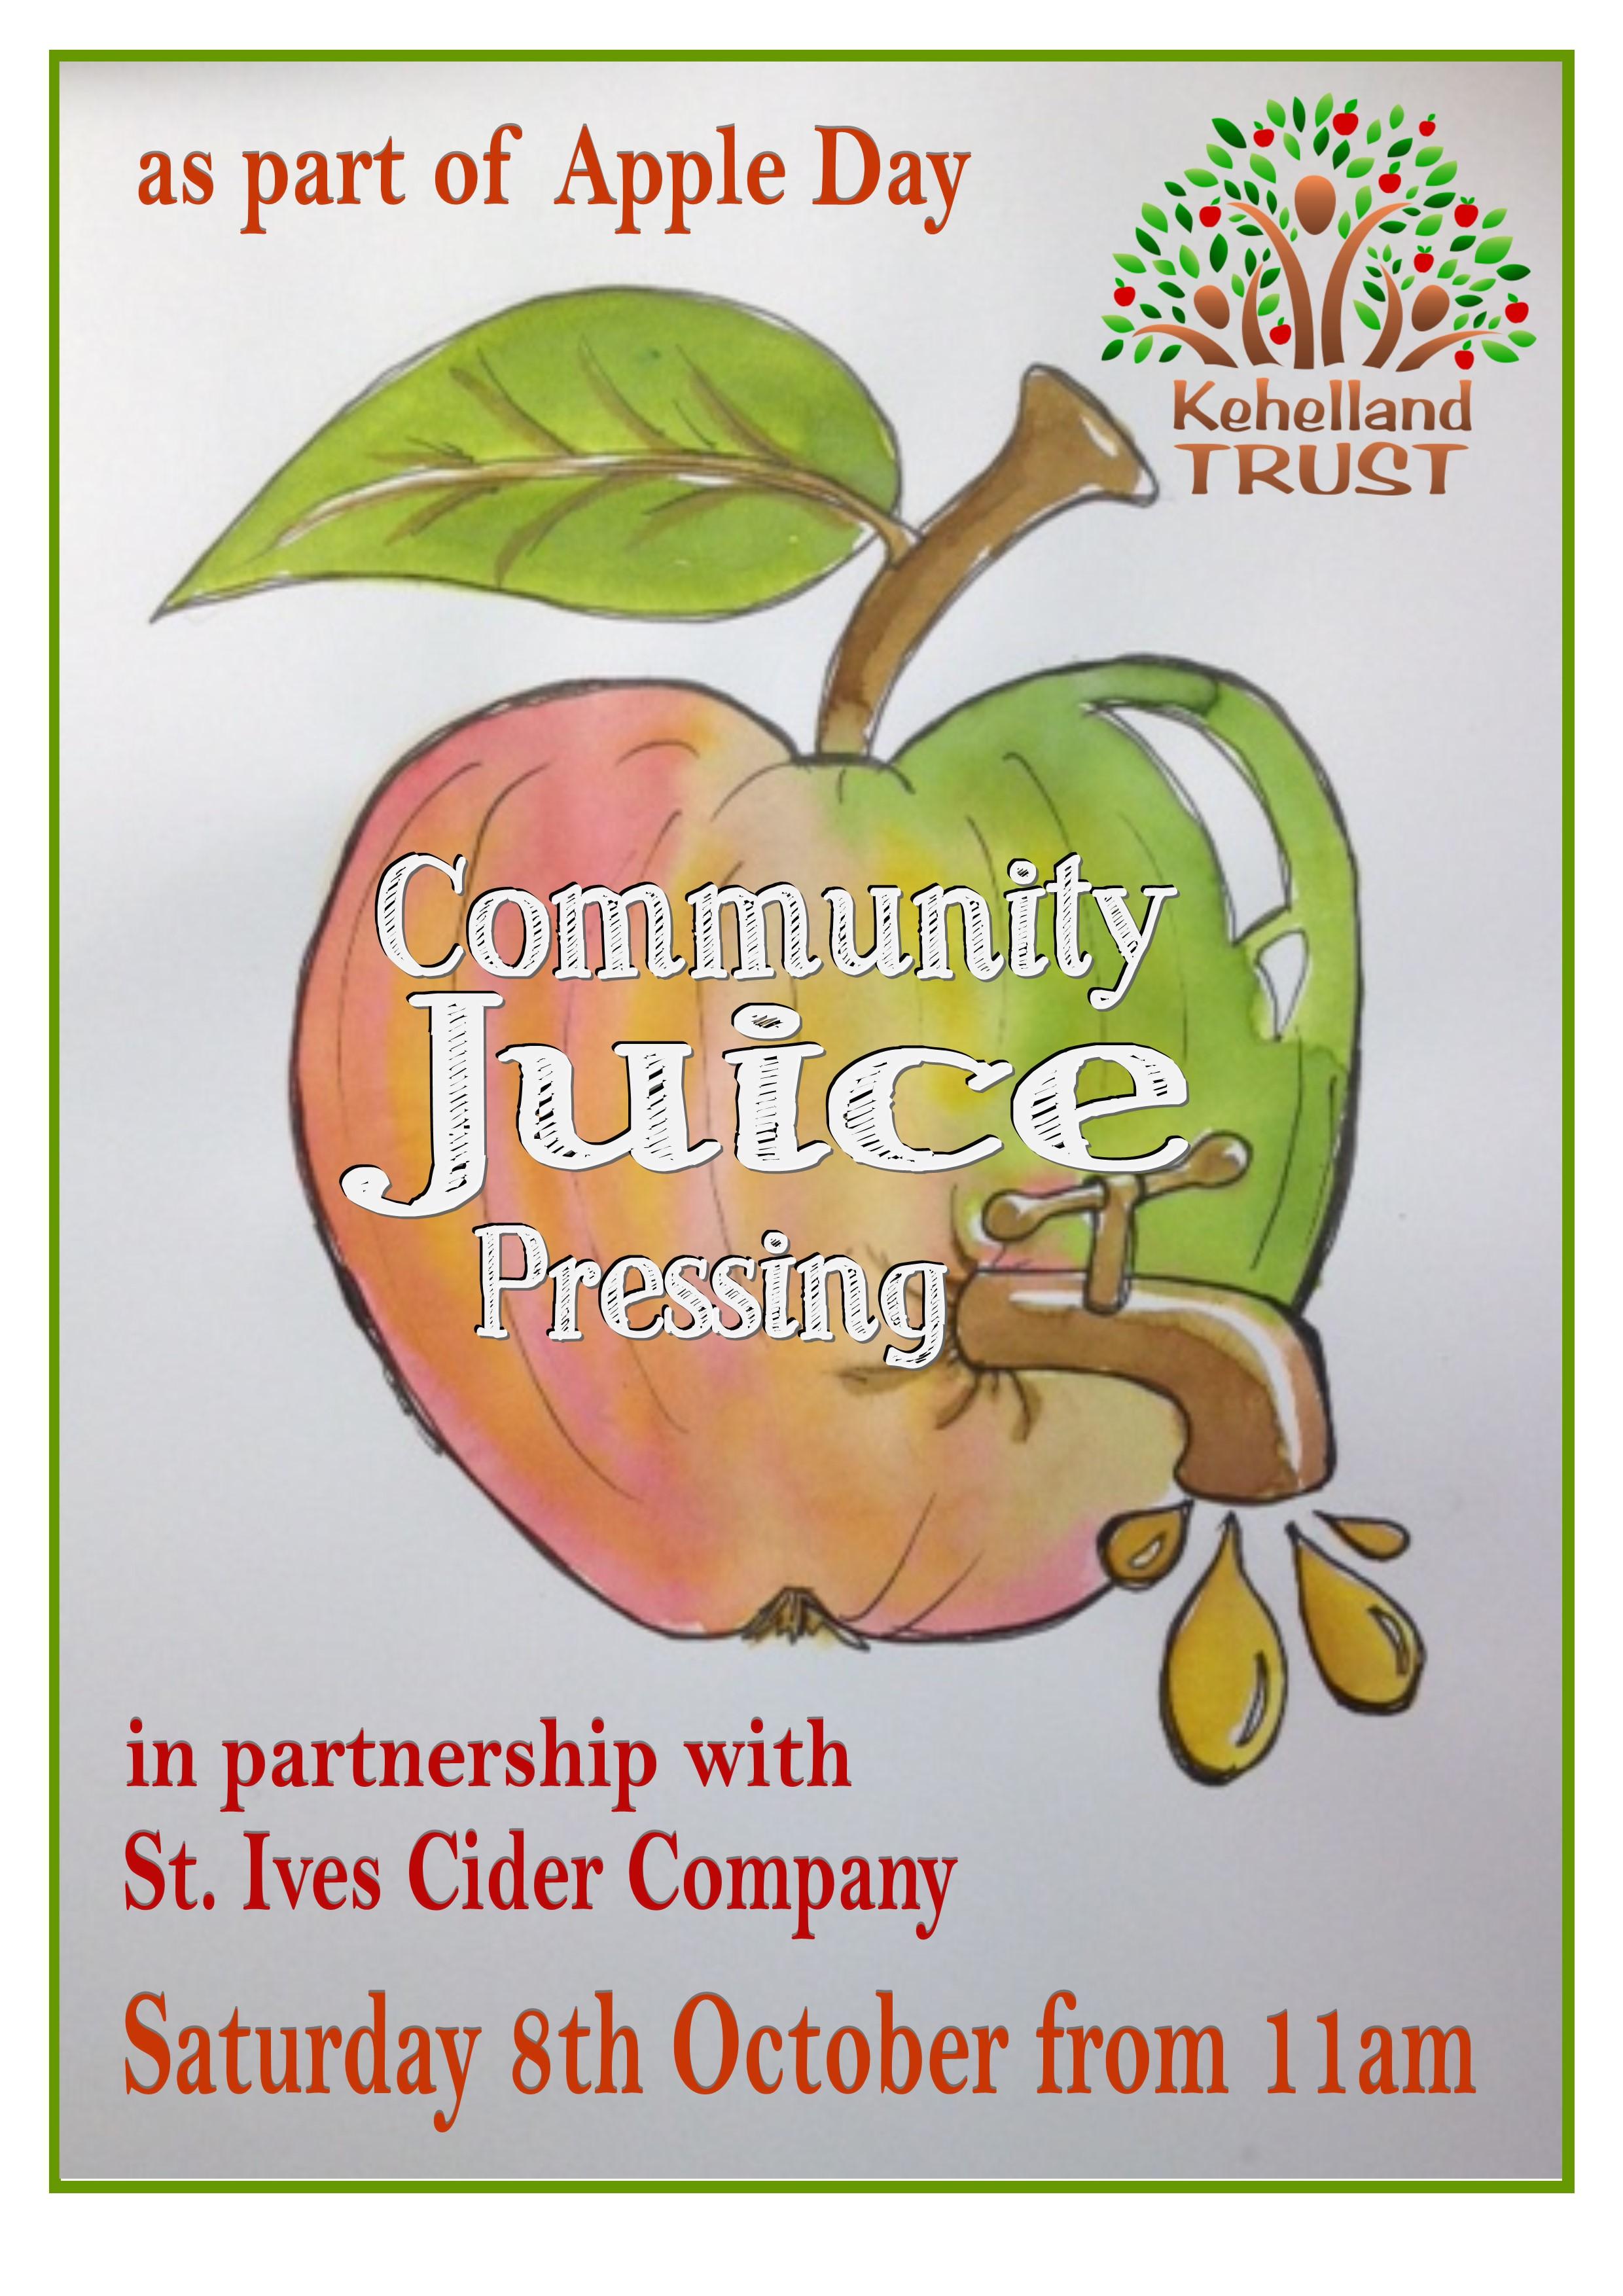 Community Juice Press @ Kehelland Apple Day